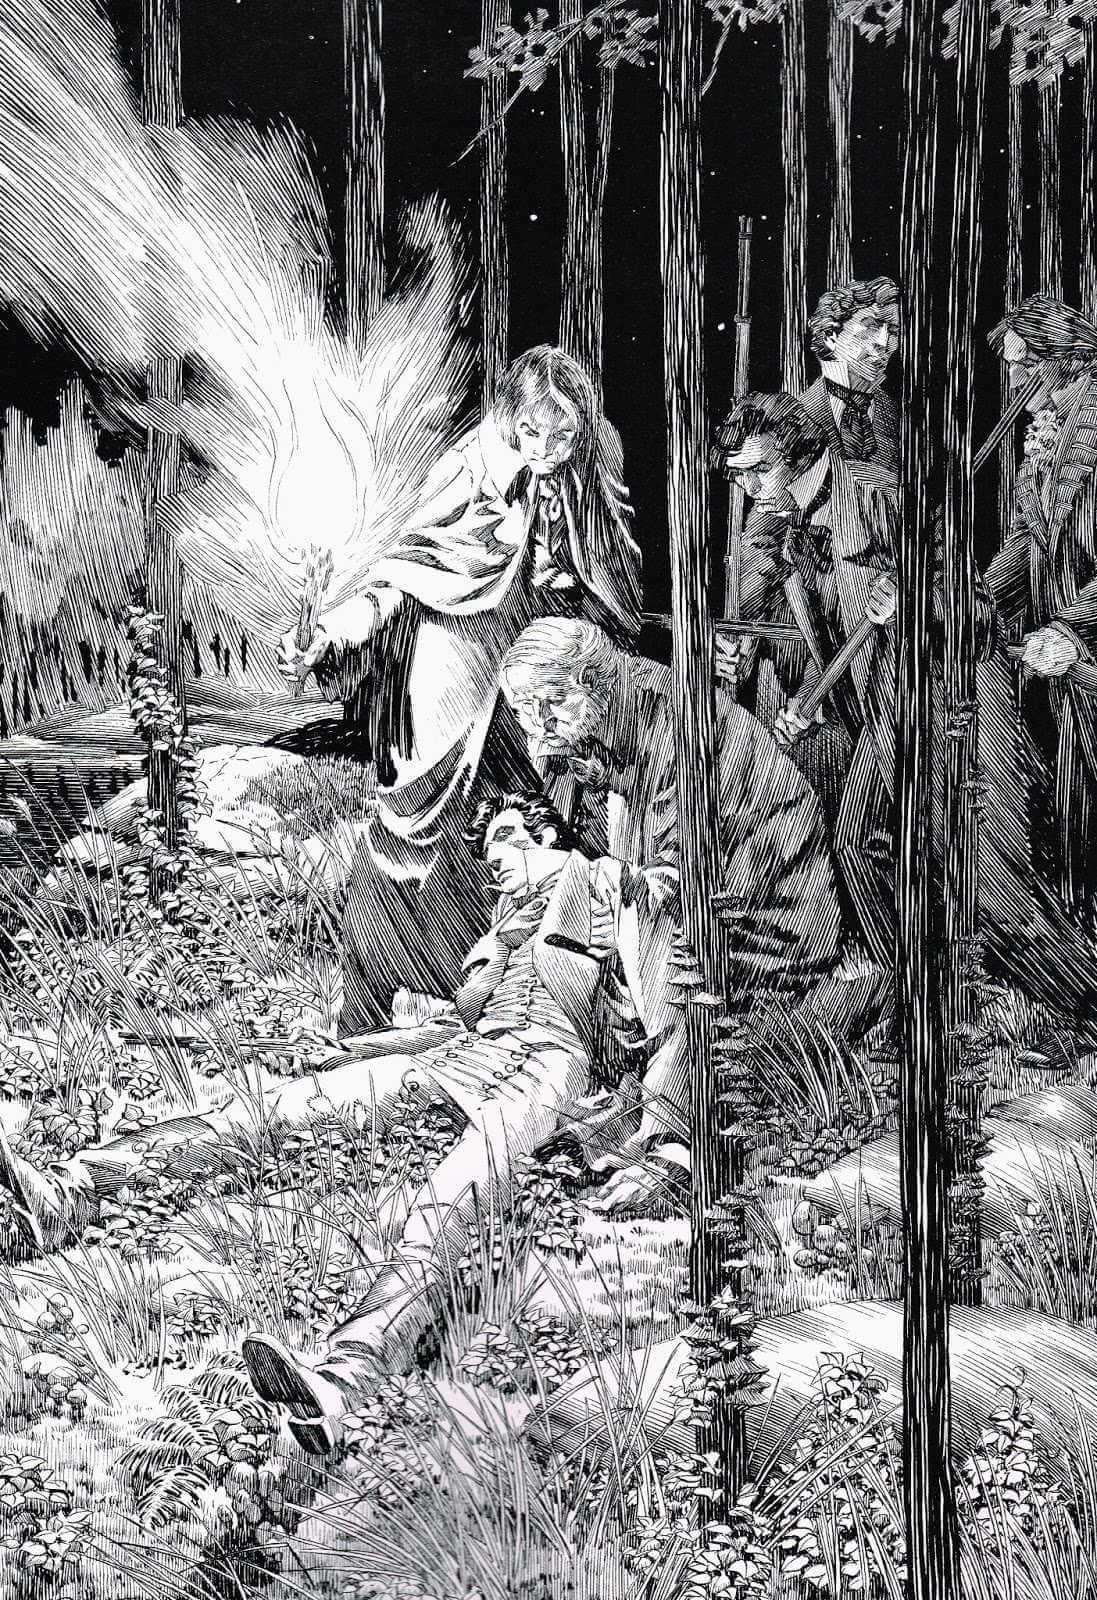 ilustración de frankstein de bernie wrightson